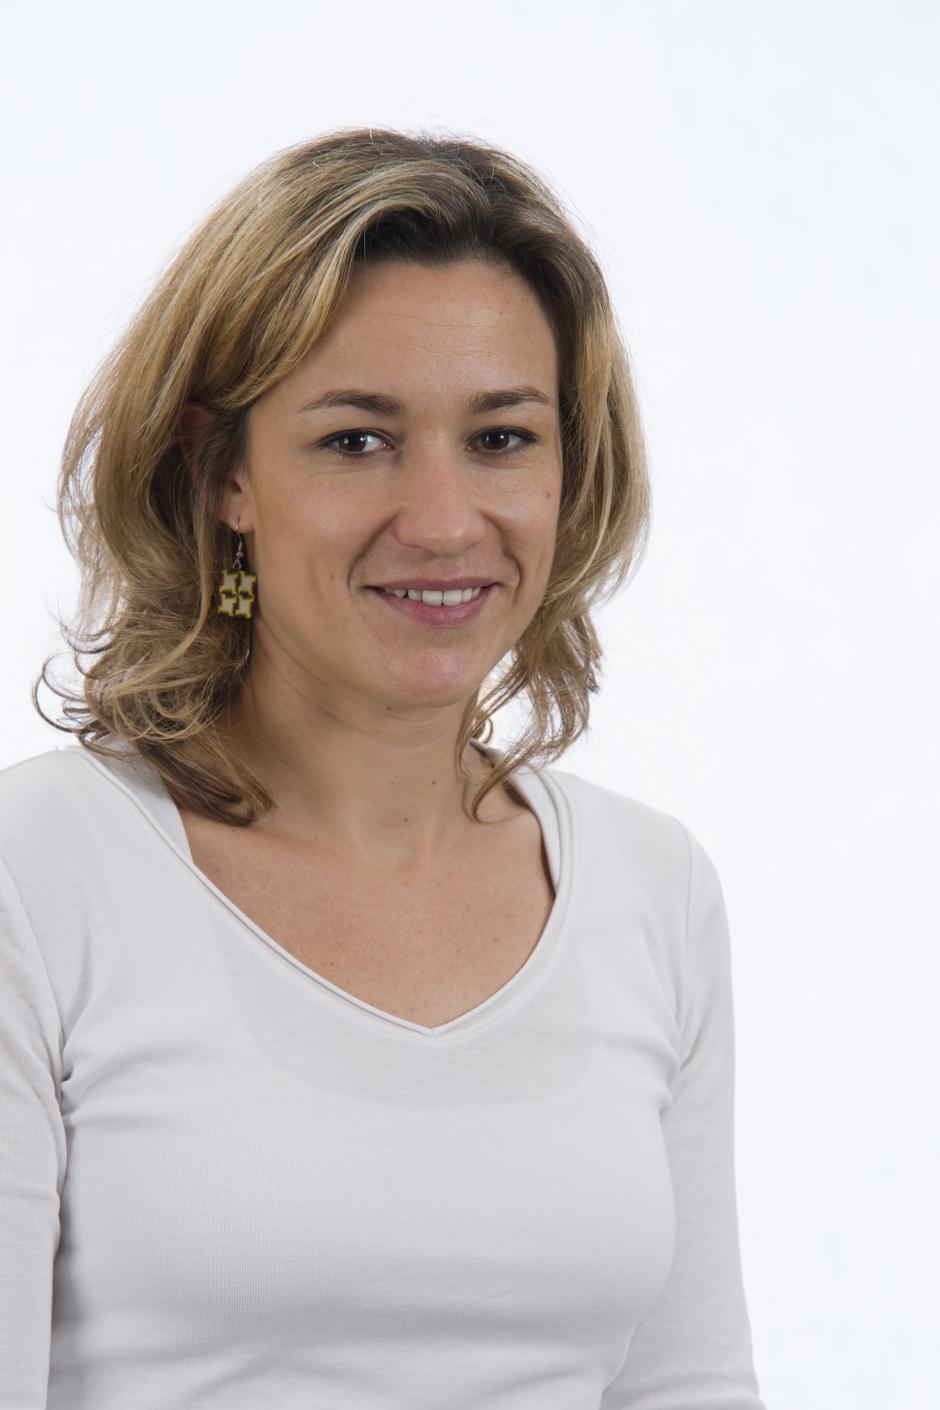 Émilie Dareau